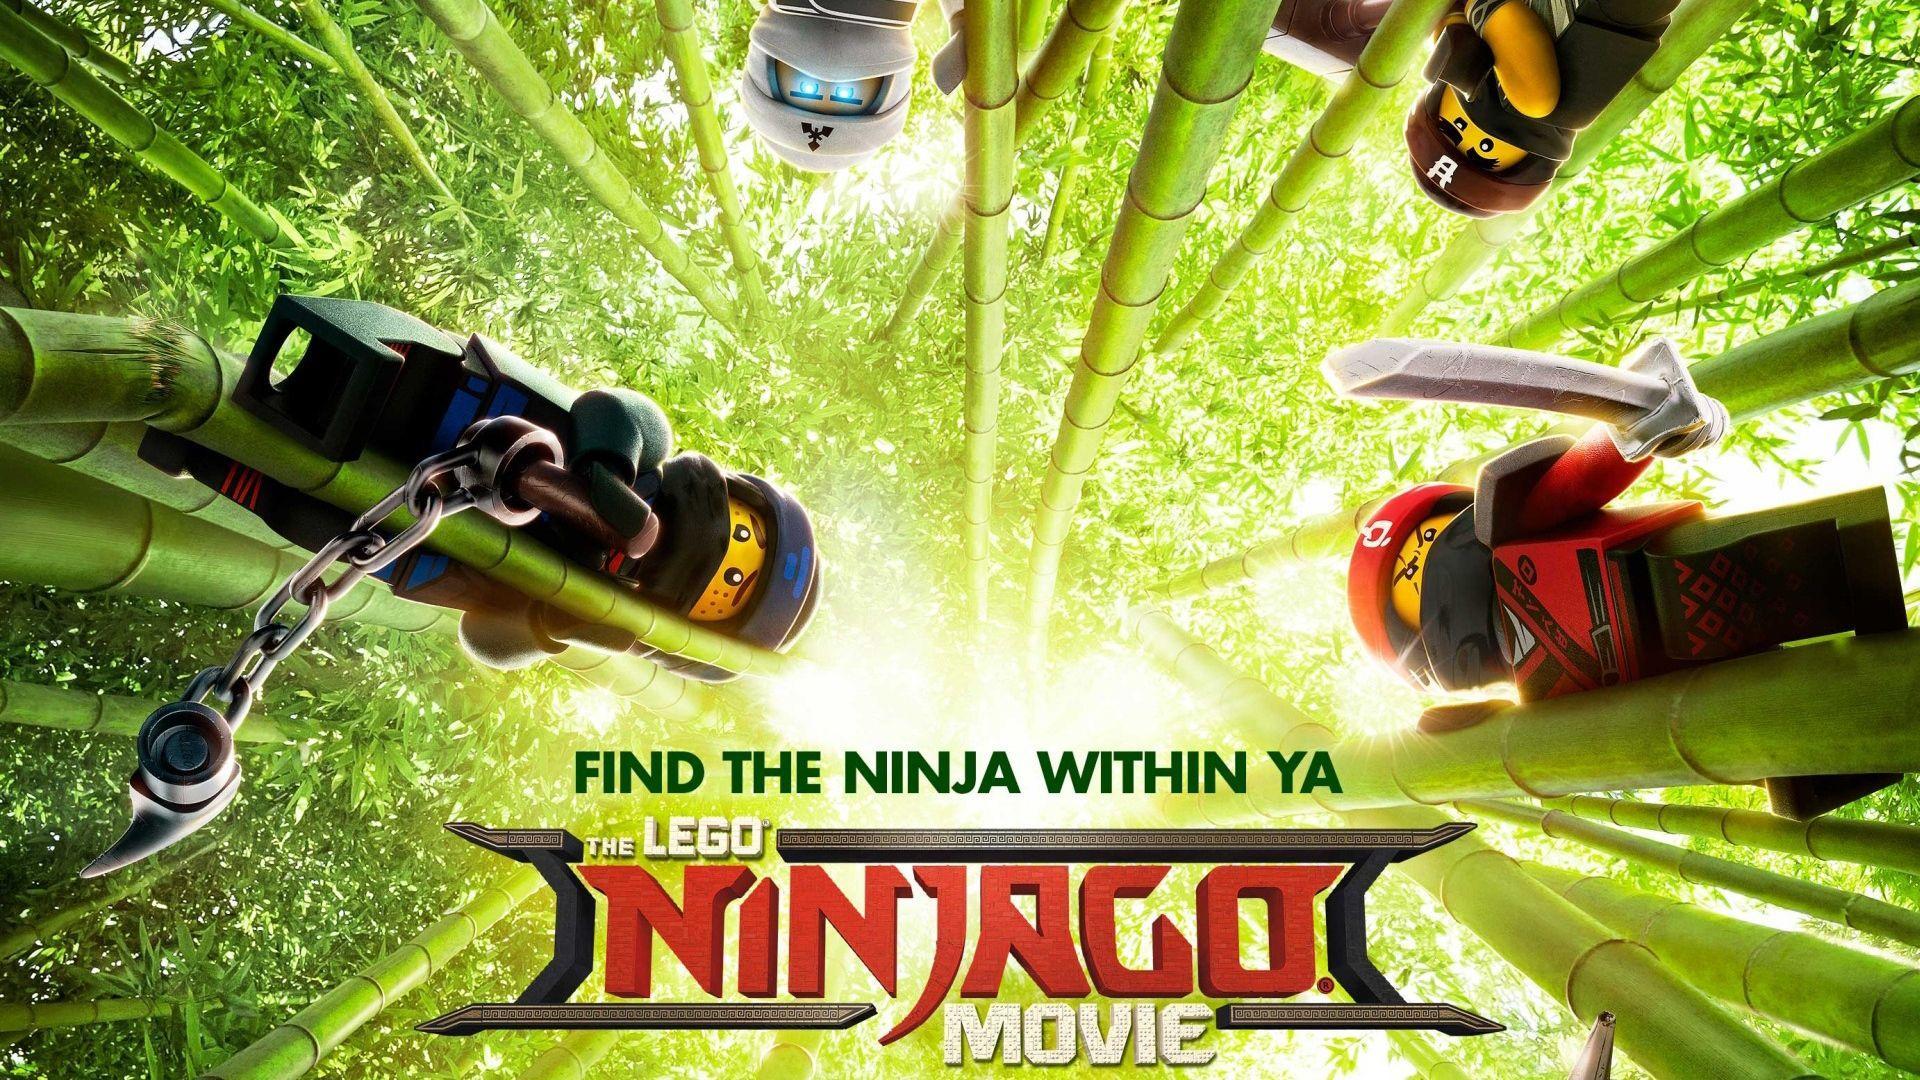 The lego ninjago movie wallpapers wallpaper cave the lego ninjago movie 2017 movie 21 wallpapers voltagebd Choice Image